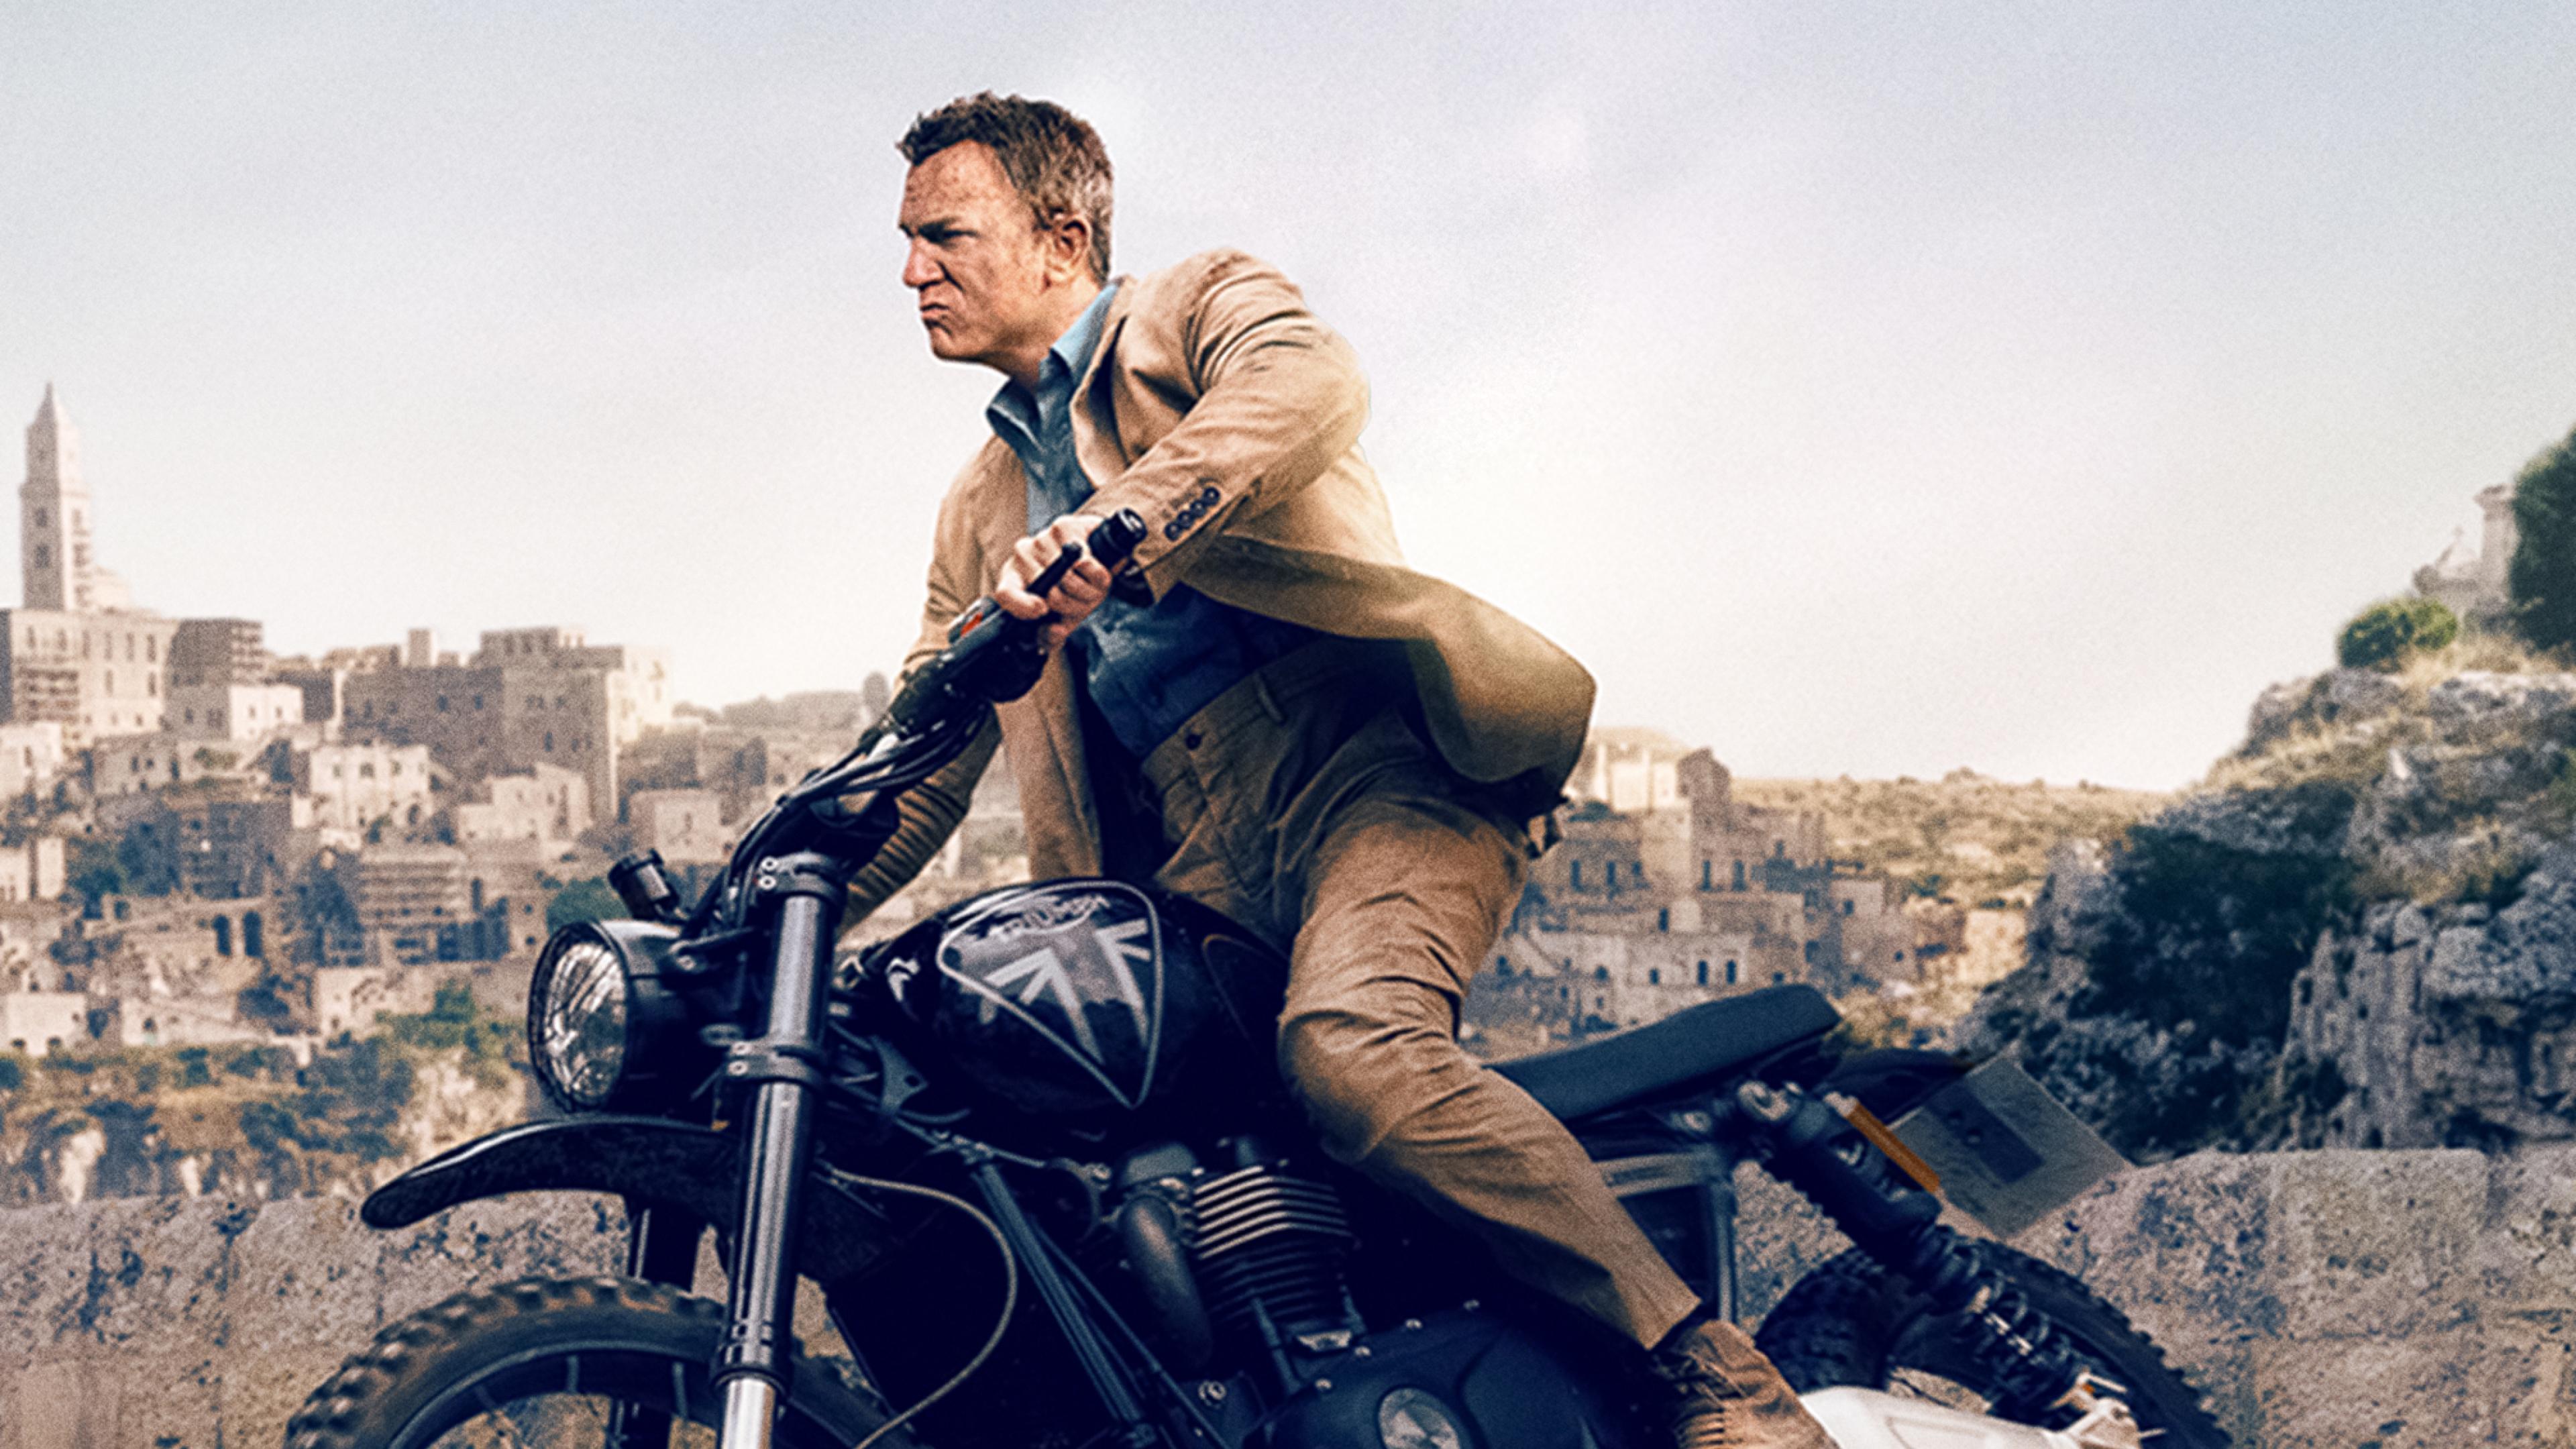 3840x2160 James Bond 2020 4K Wallpaper, HD Movies 4K ...